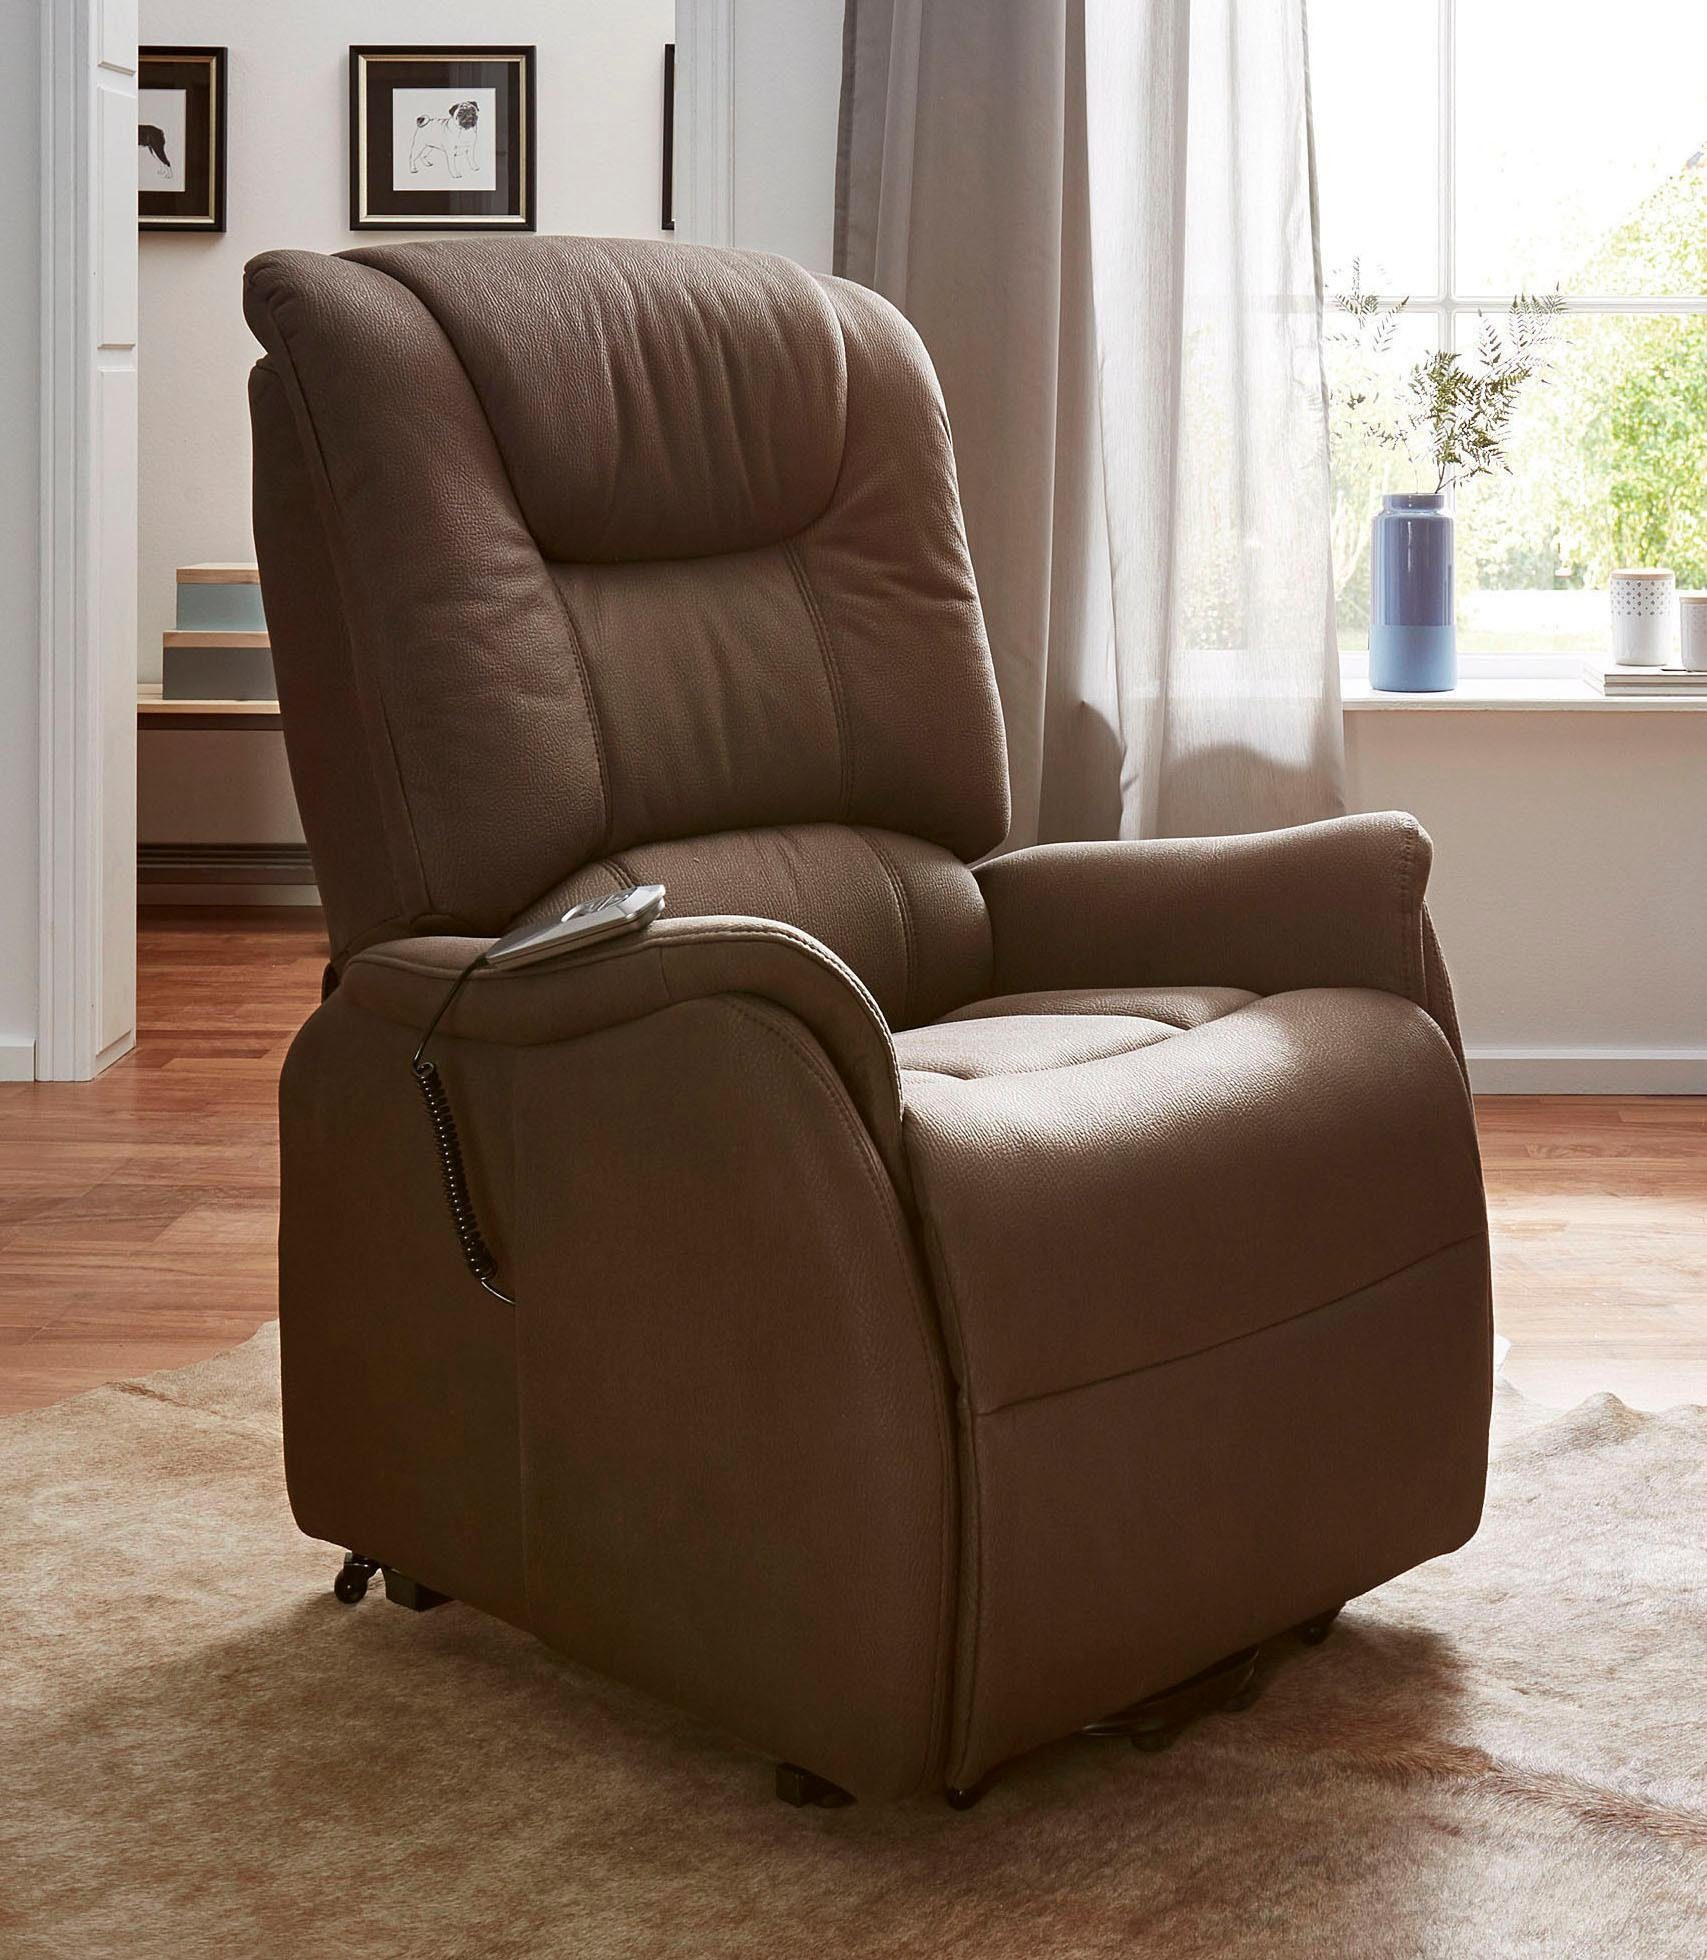 fernsehsessel xxl sessel xxl ikea elearningstrategy. Black Bedroom Furniture Sets. Home Design Ideas